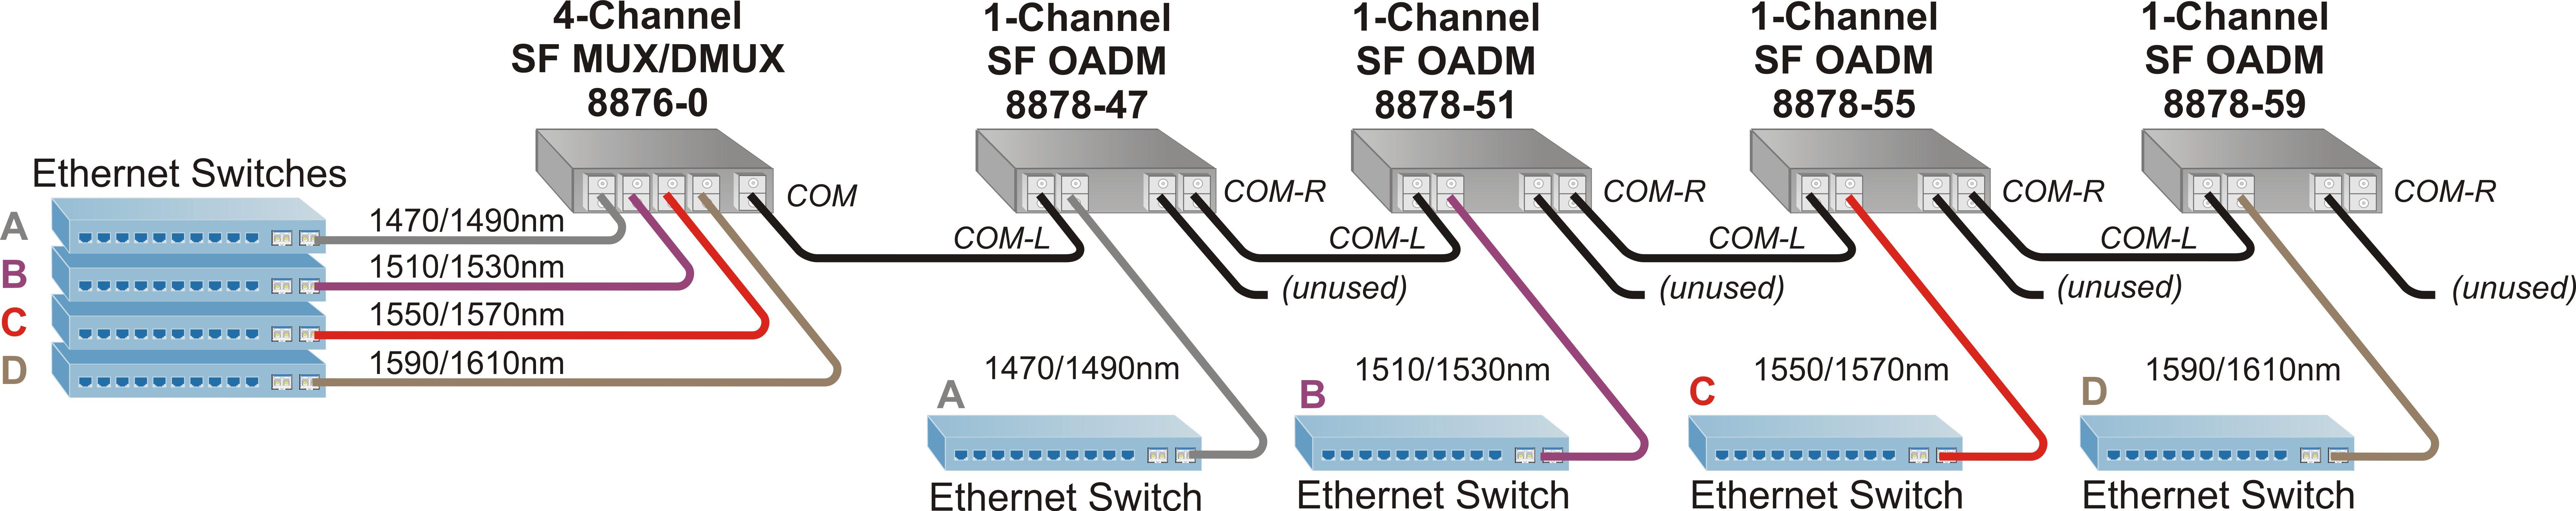 Single Fiber CWDM Multiplexer | Single Fiber CWDM MUX and Add Drop